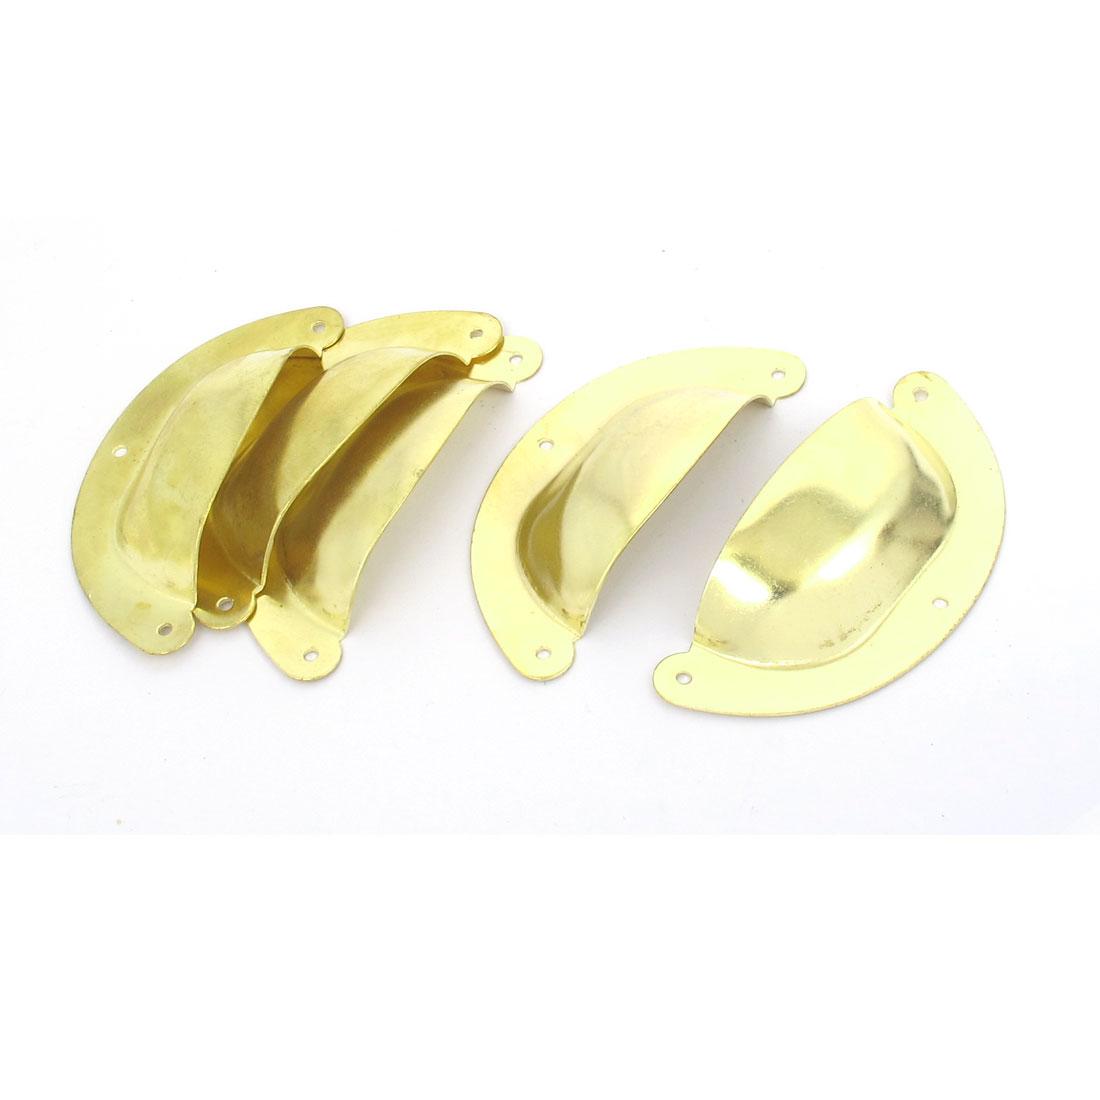 Home Shell Design Closet Drawer Dresser Door Pull Handle Gold Tone 5pcs